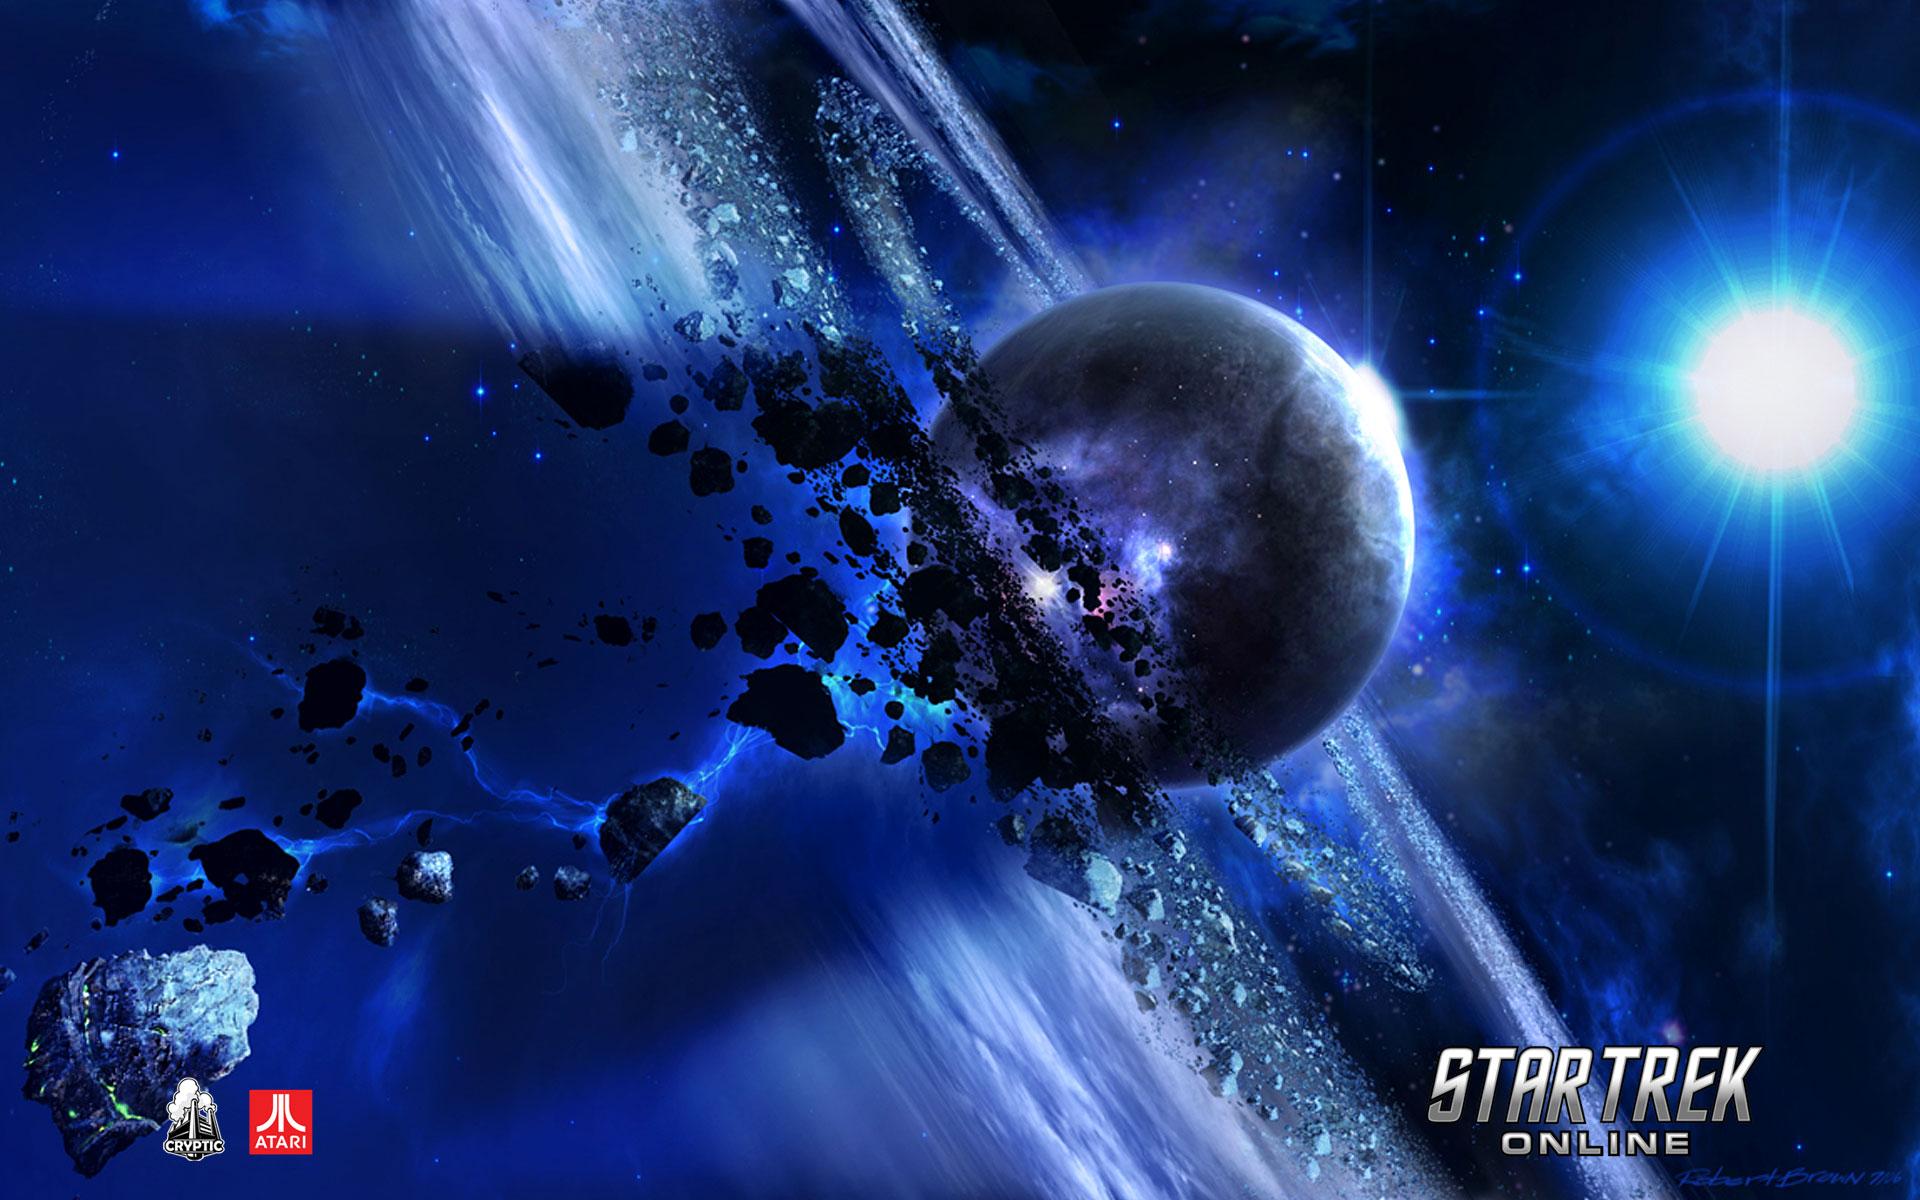 Star Trek Online wallpaper   435898 1920x1200